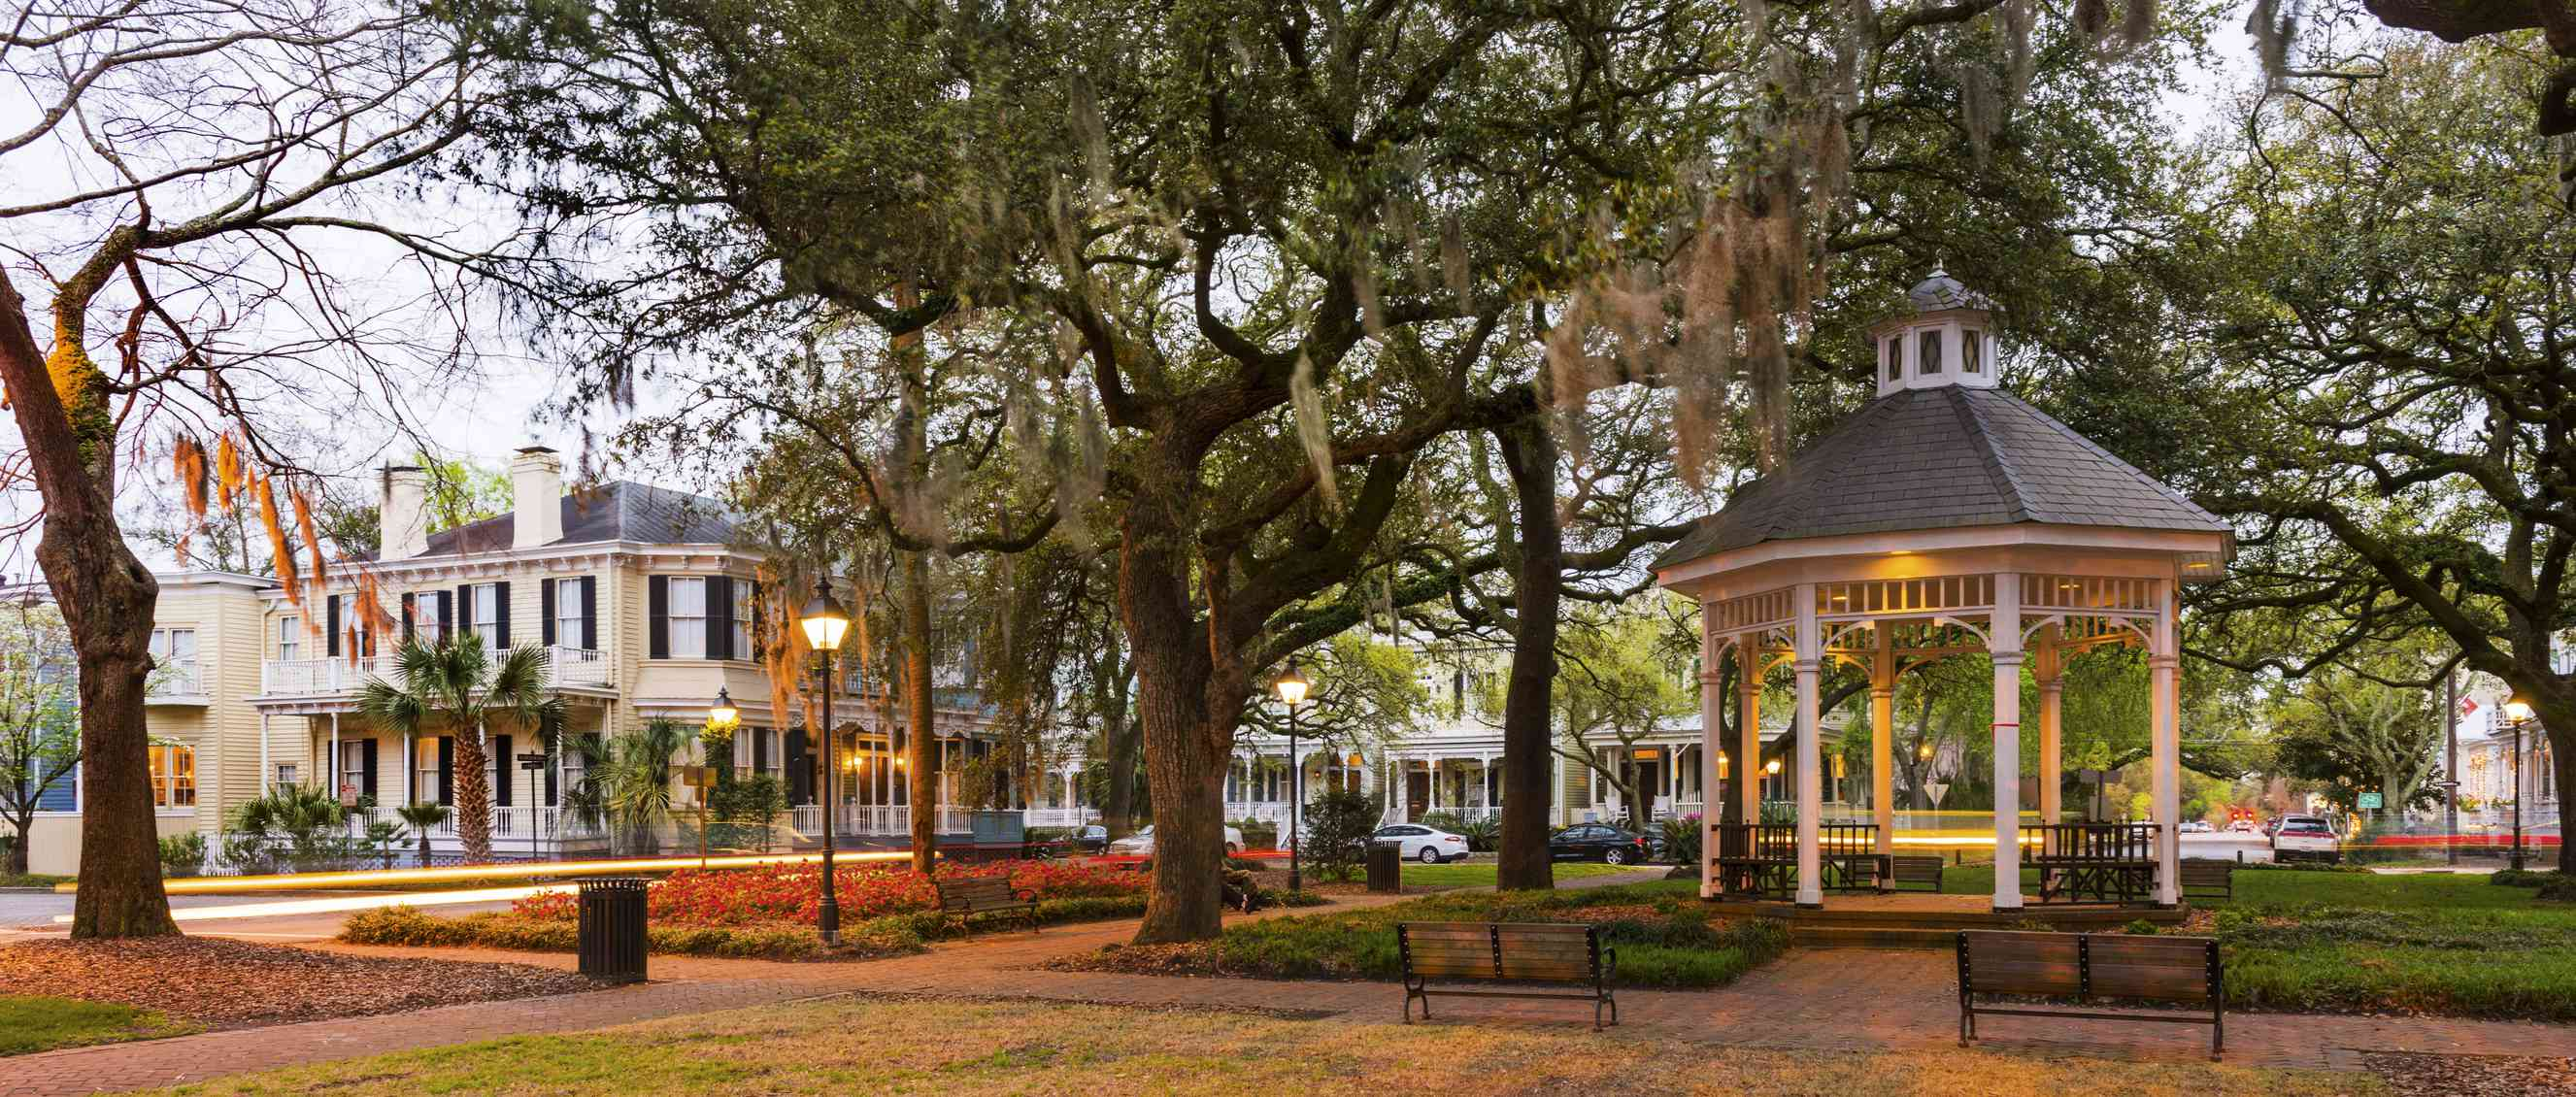 Distrito histórico en Savannah, GA